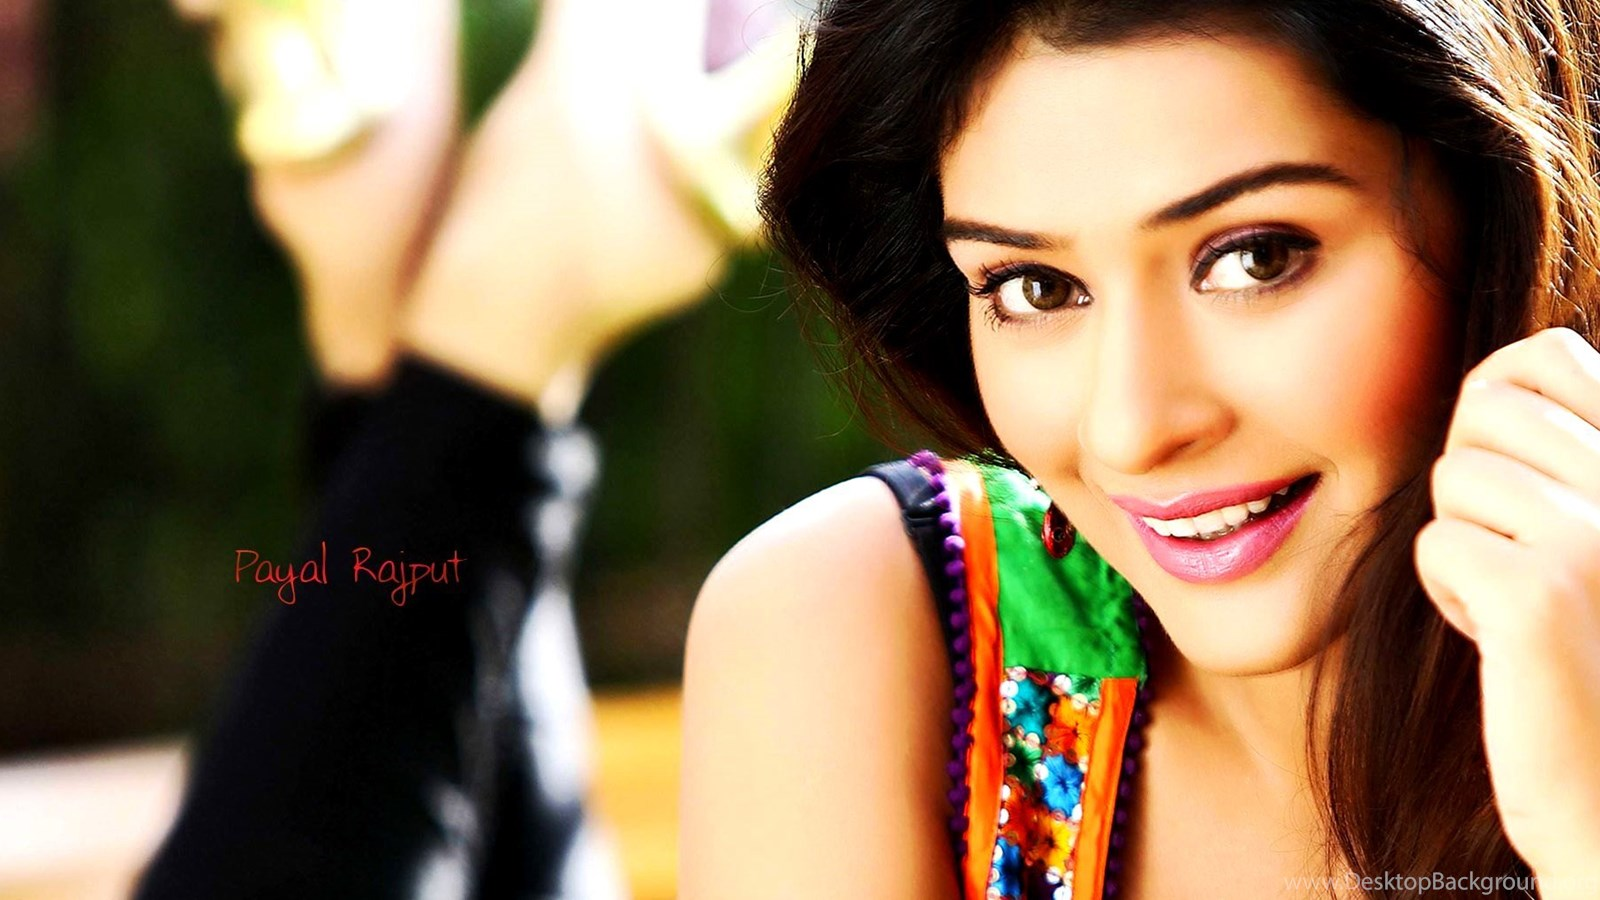 payal rajput sweet hd wallpaper images desktop background